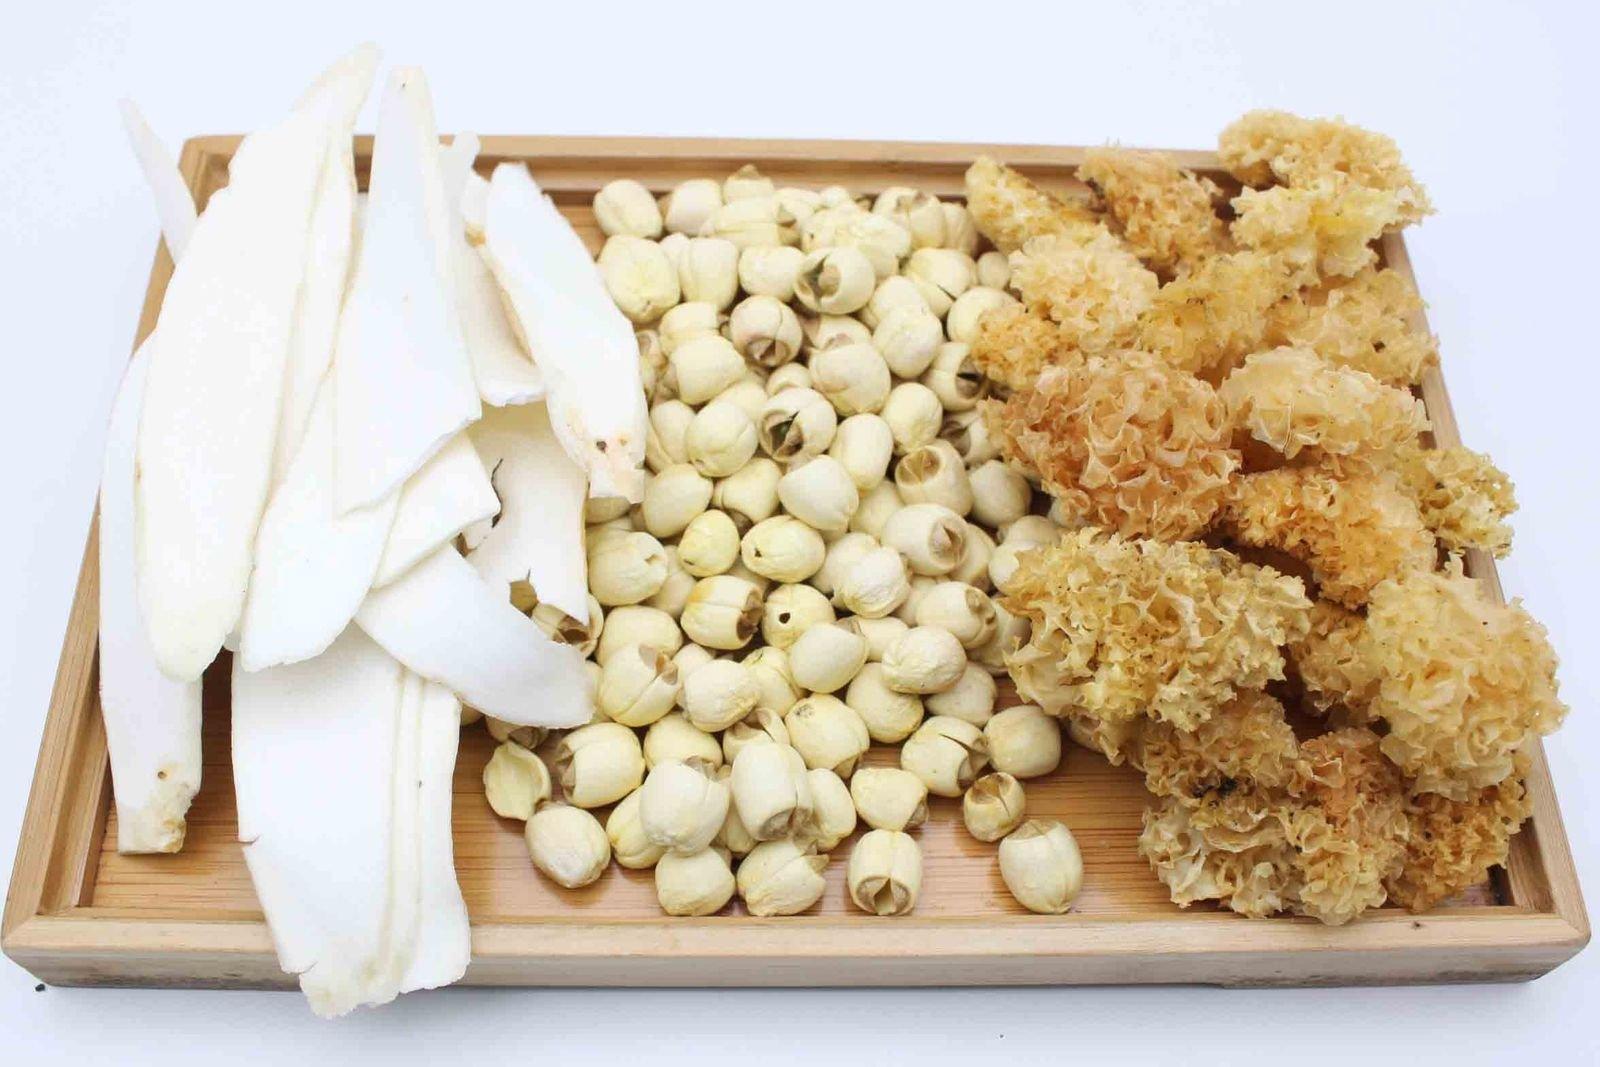 China Good Food Set-39 Dried Chinese Yam 生晒淮山 x Bailian 白蓮 x Zhang Zhou Snow Fungus 漳洲丙耳